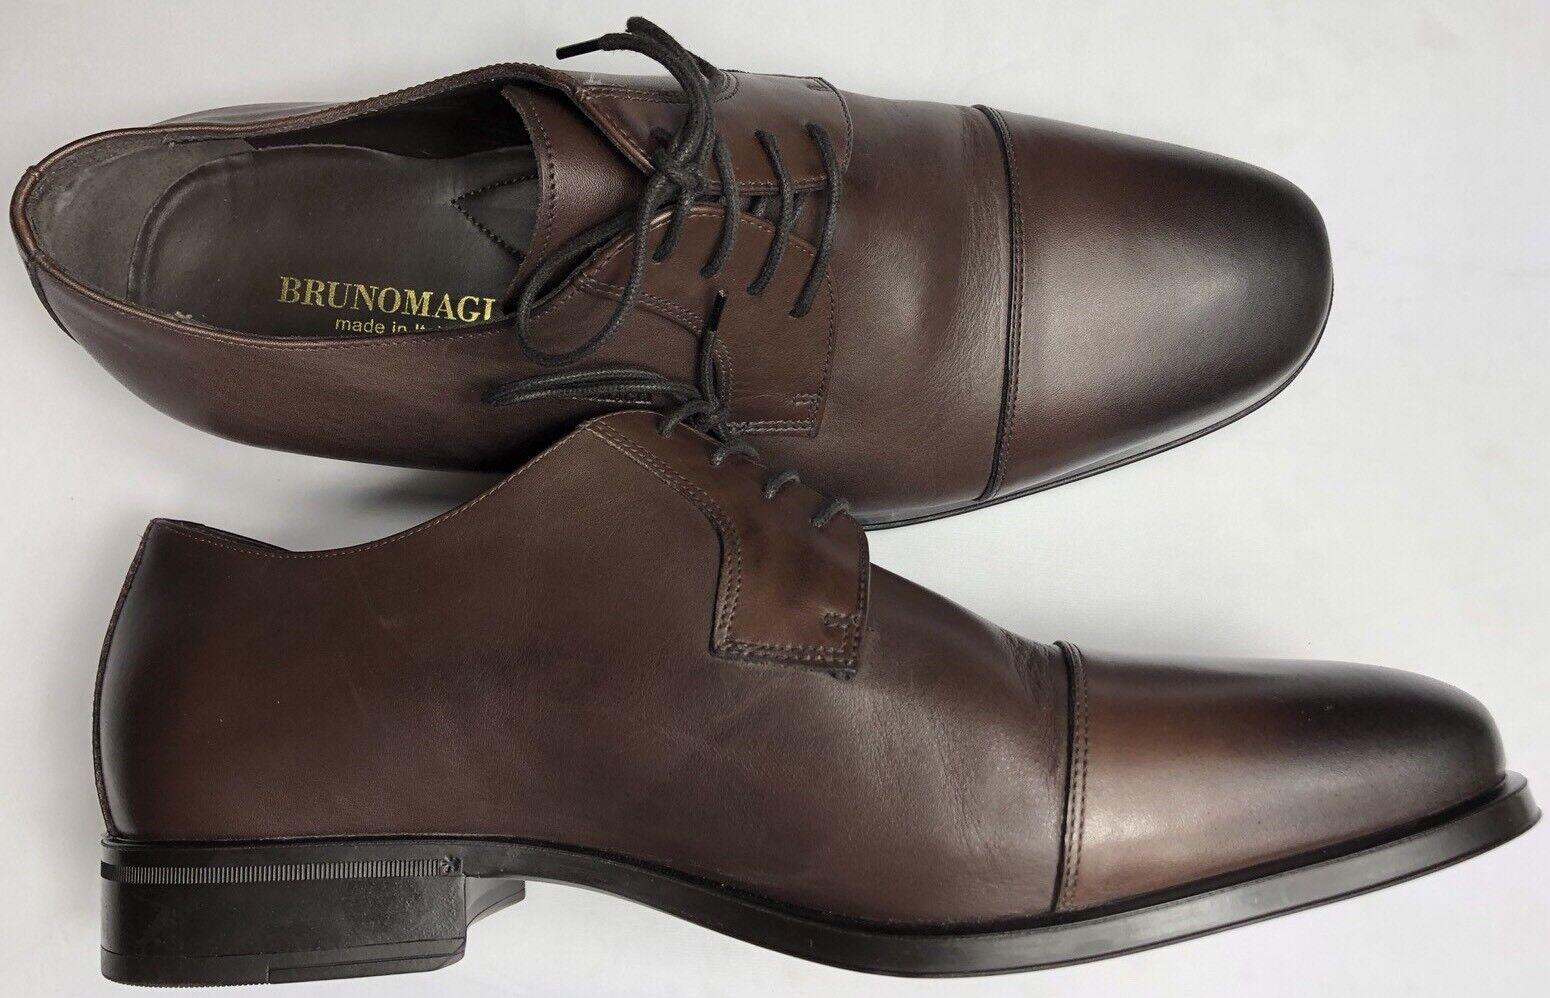 Bruno Magli Men's Cap Toe Dress Oxford Hand Burnished Leather scarpe MN2903 10.5